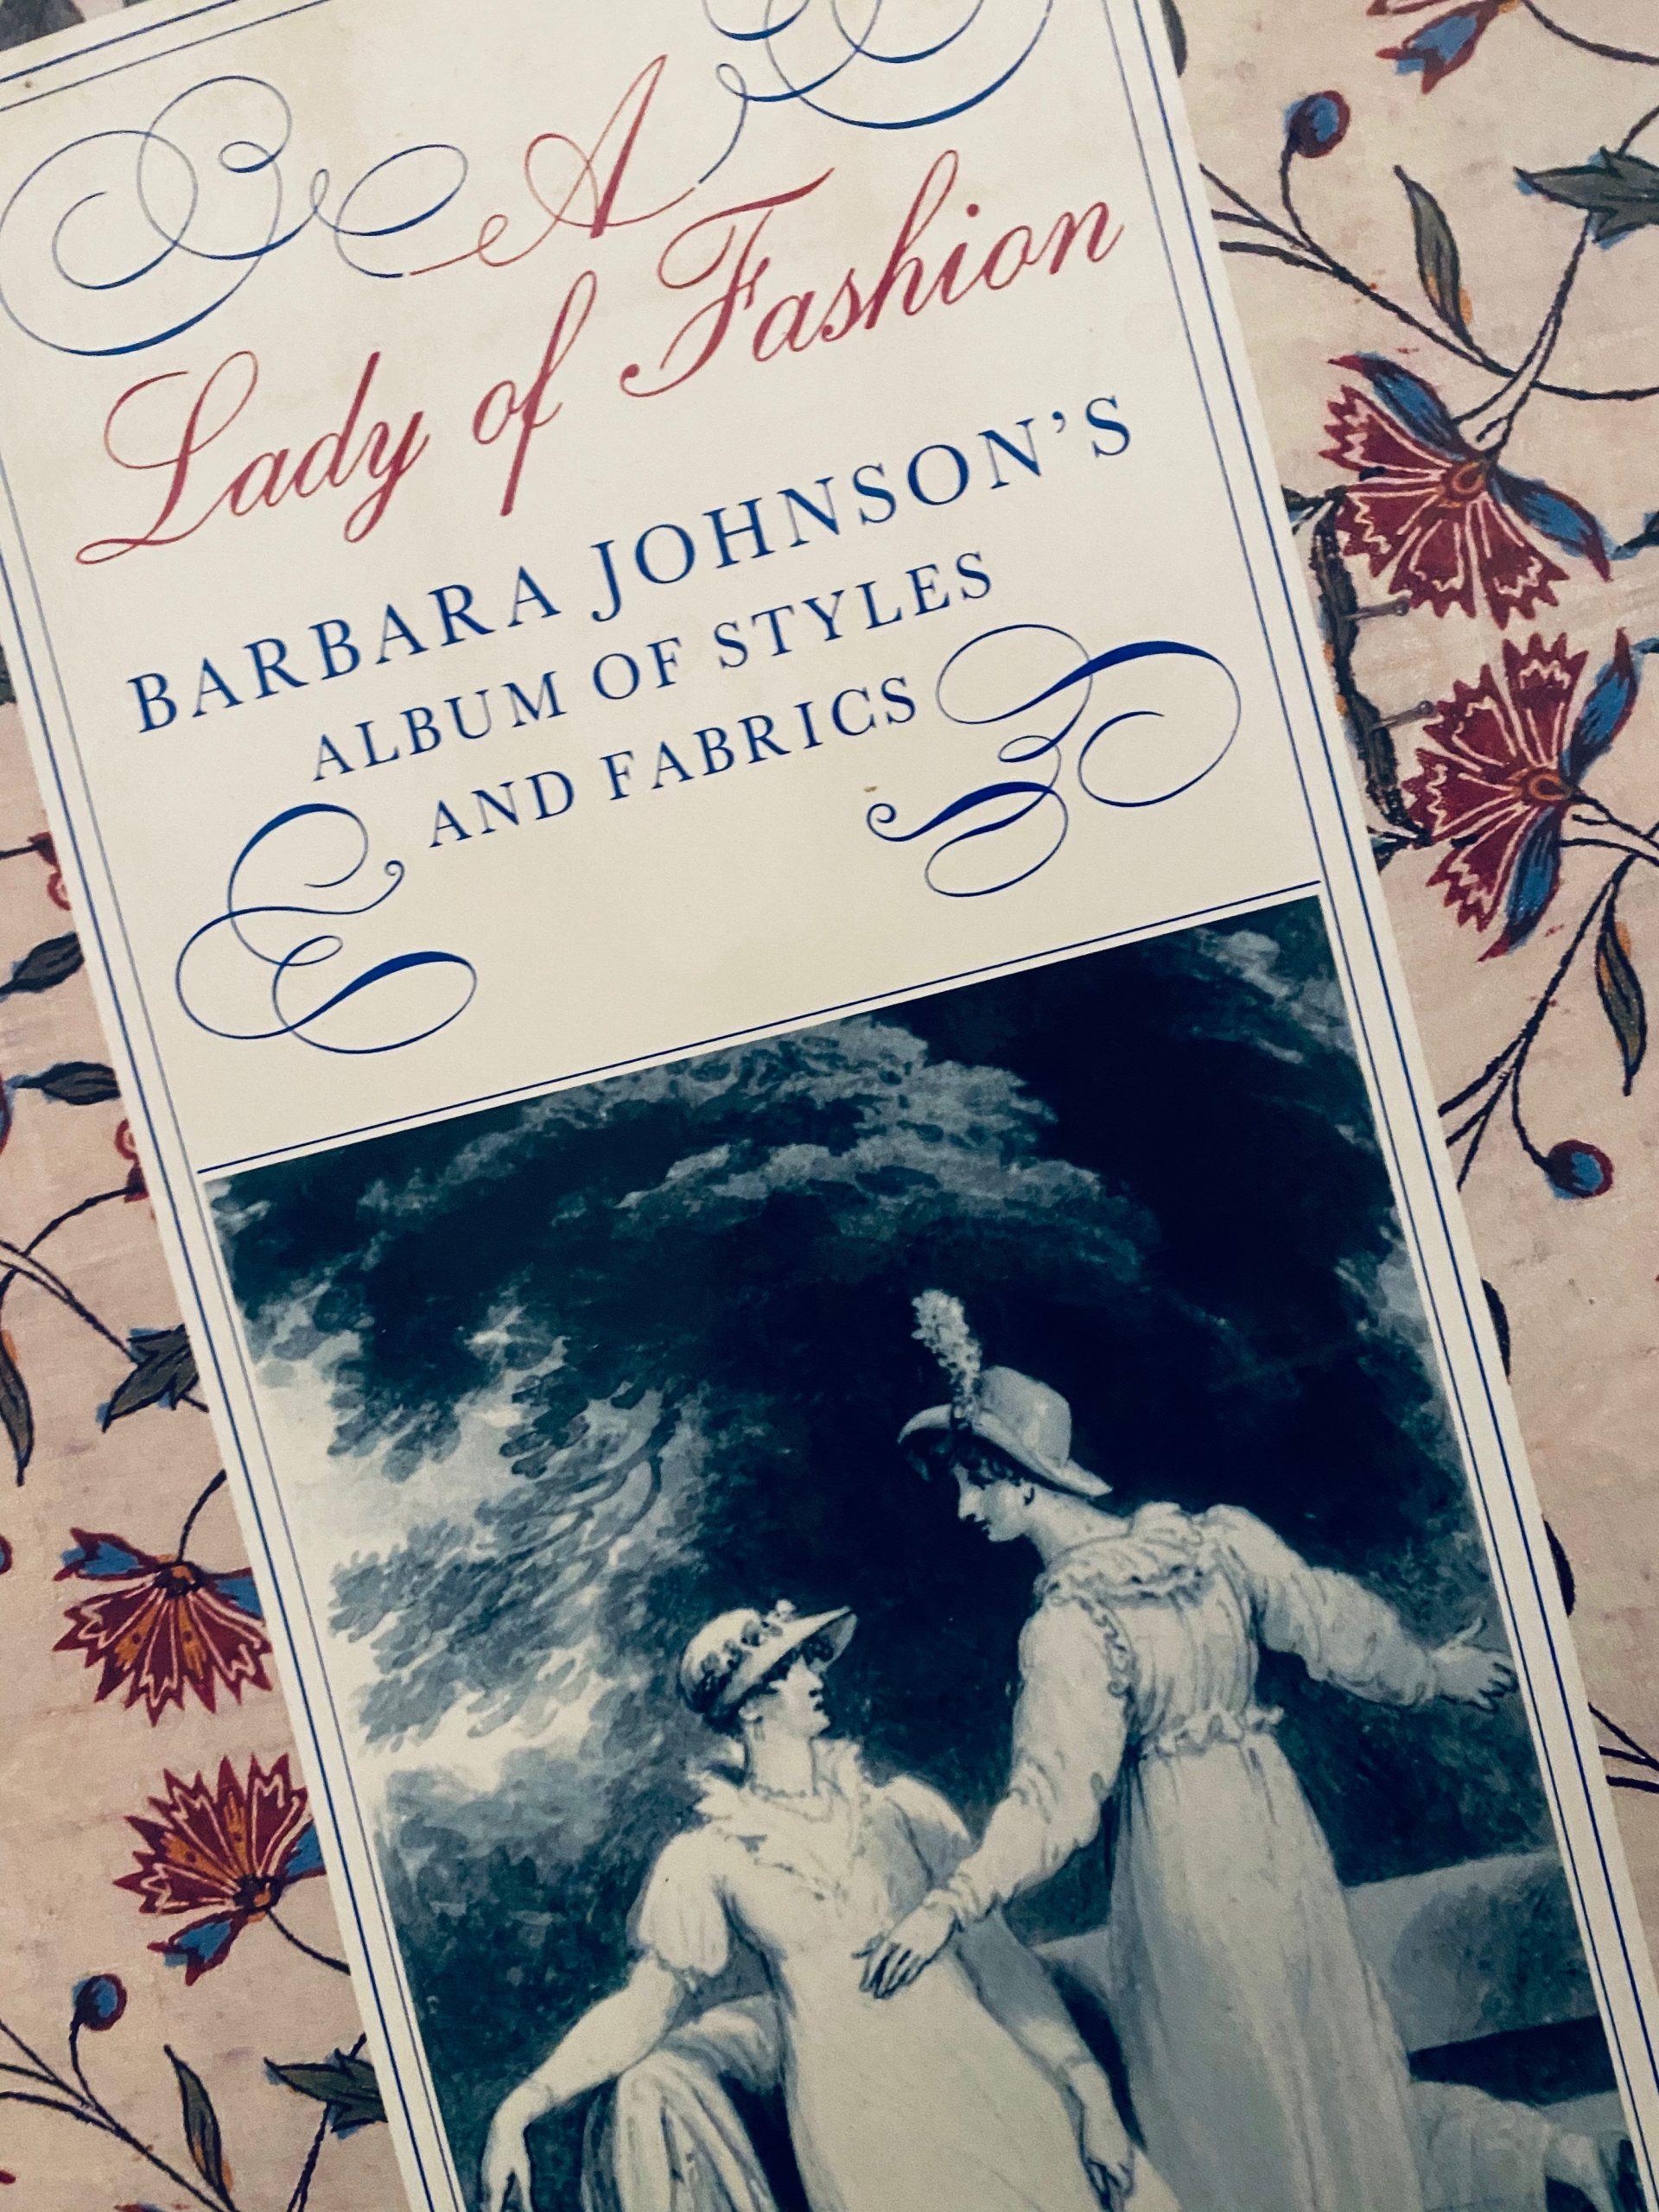 1000 books: A Lady of Fashion.